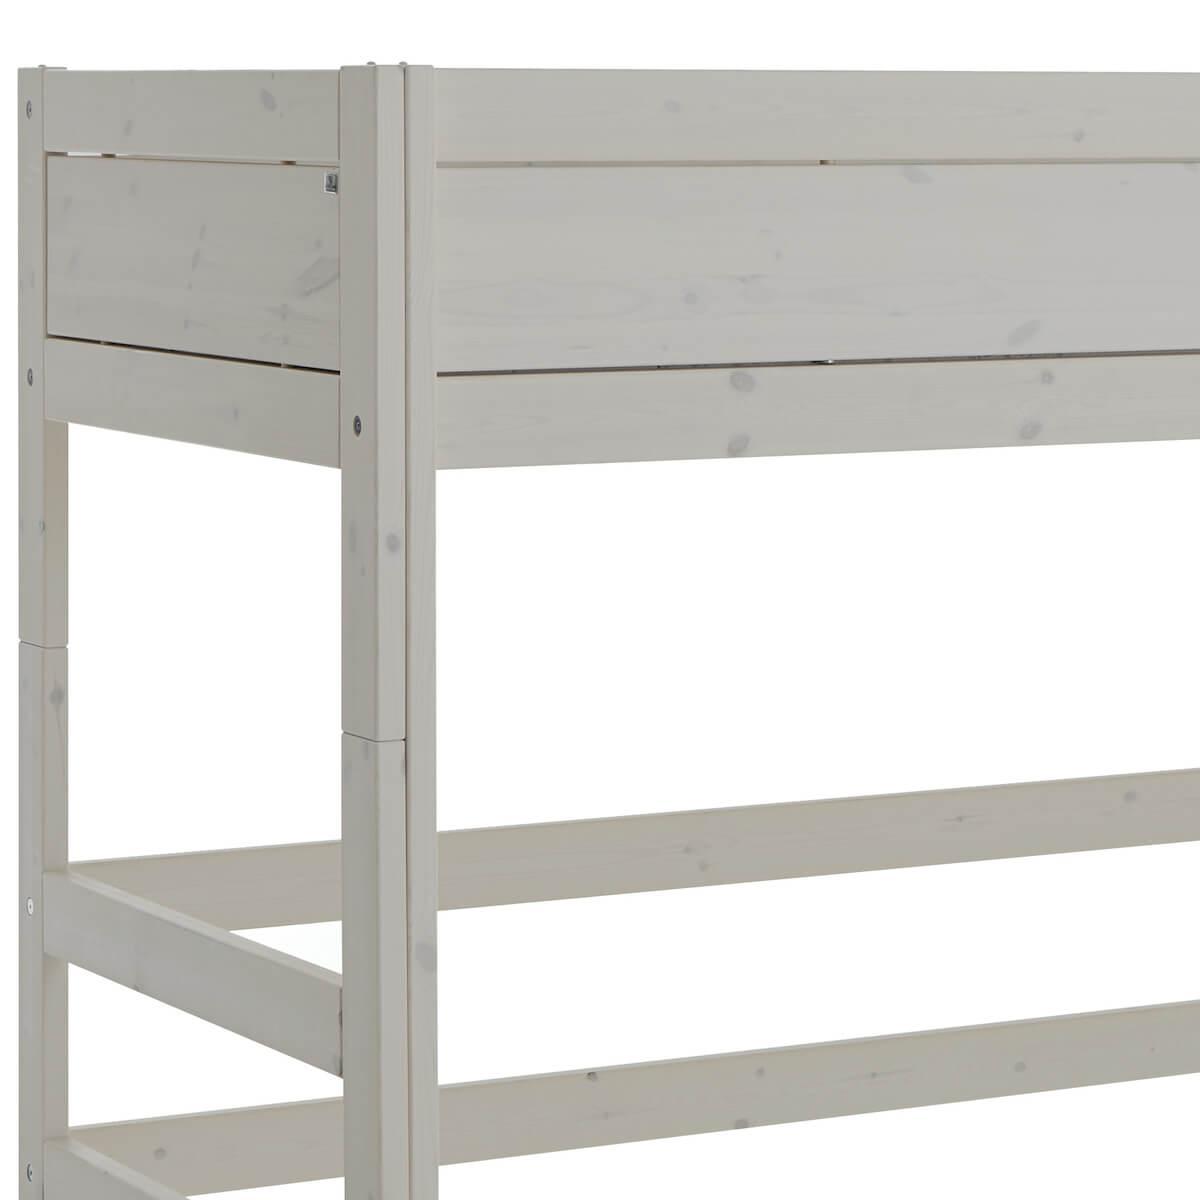 Cama semi alta 90x200cm escalera inclinada Lifetime gris